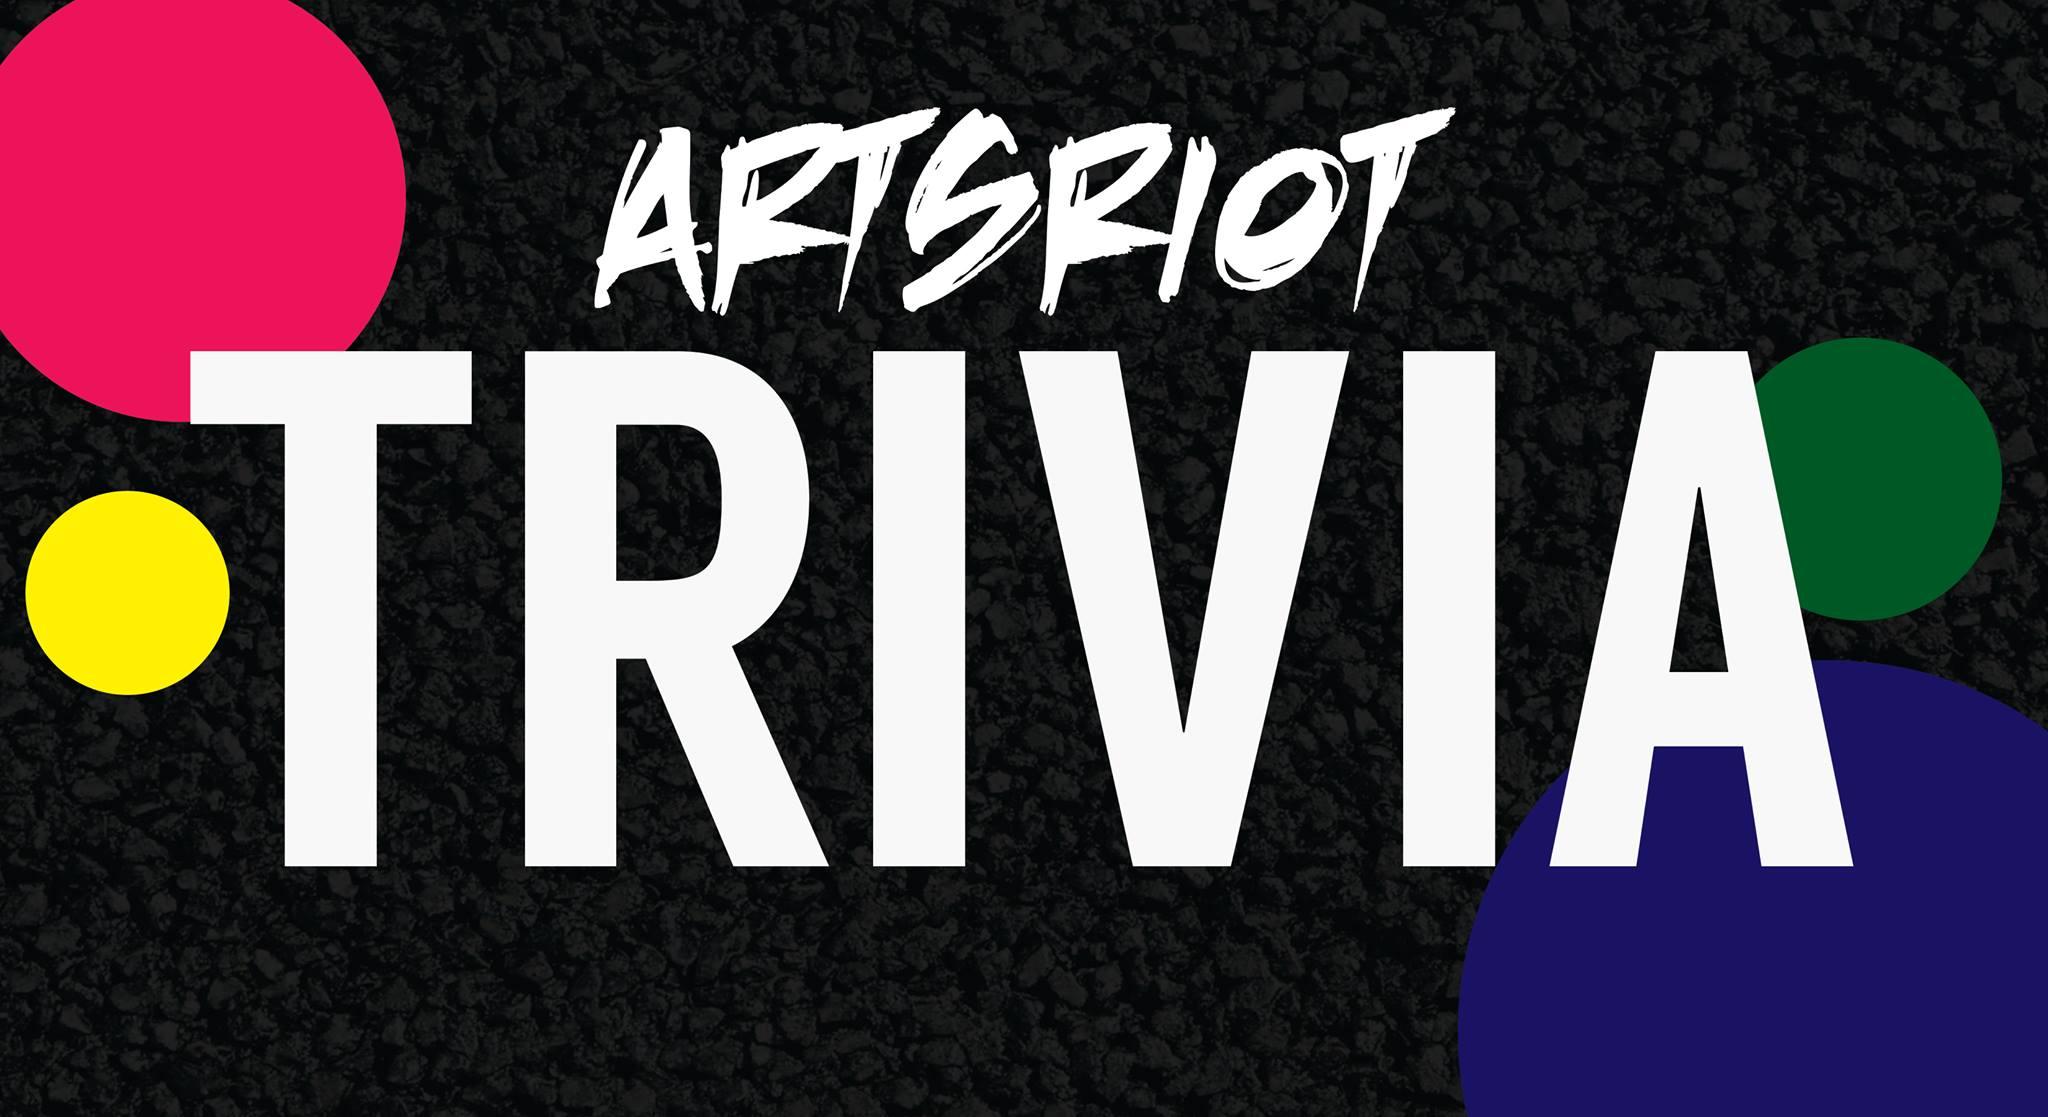 trivia artsriot